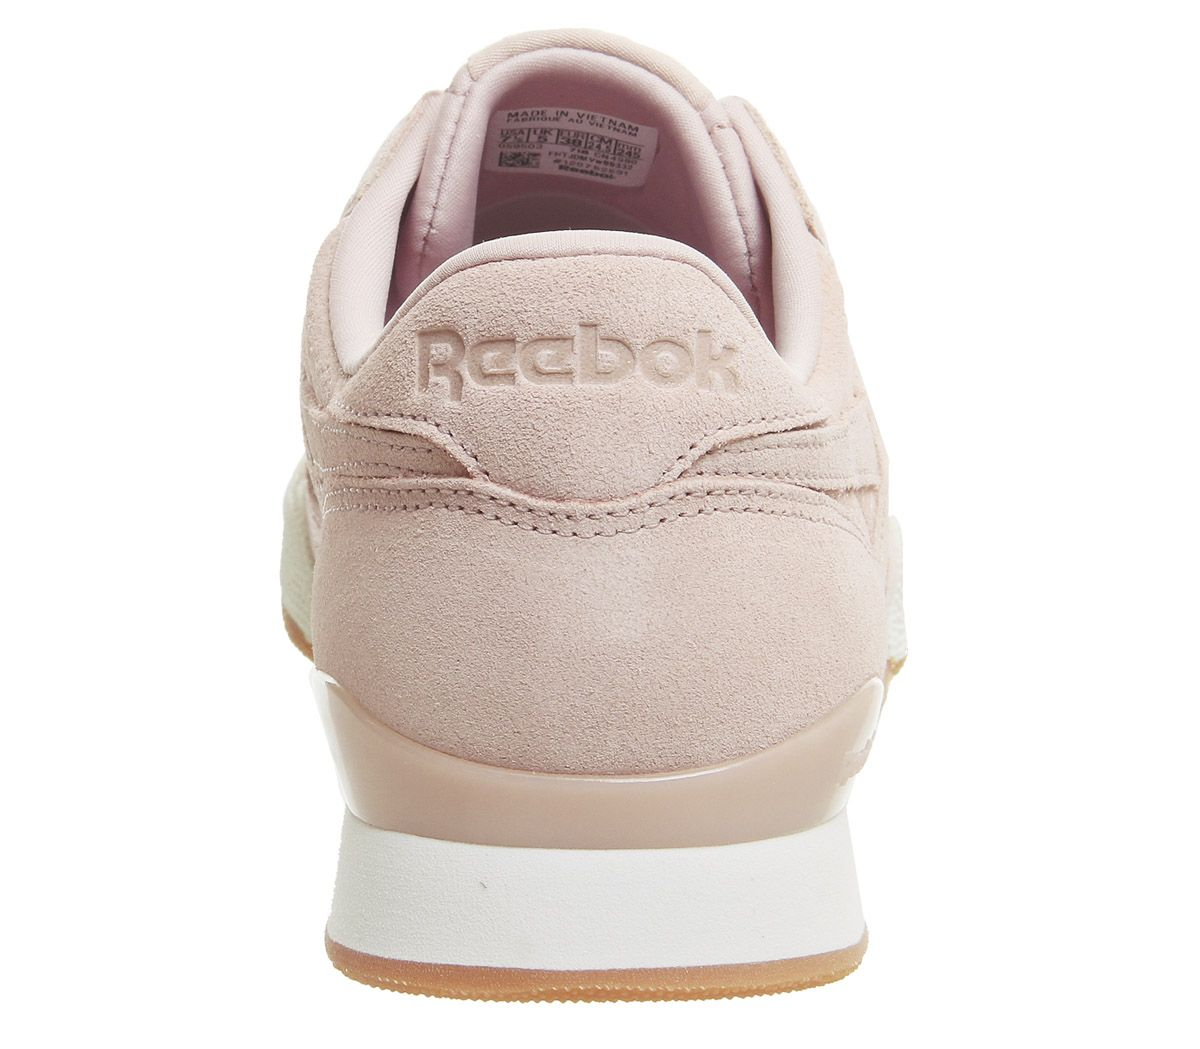 79ccbf24f35 Reebok Phase 1 Pro Trainers Exotics Bare Beige Chalk Pale Pink Gum ...